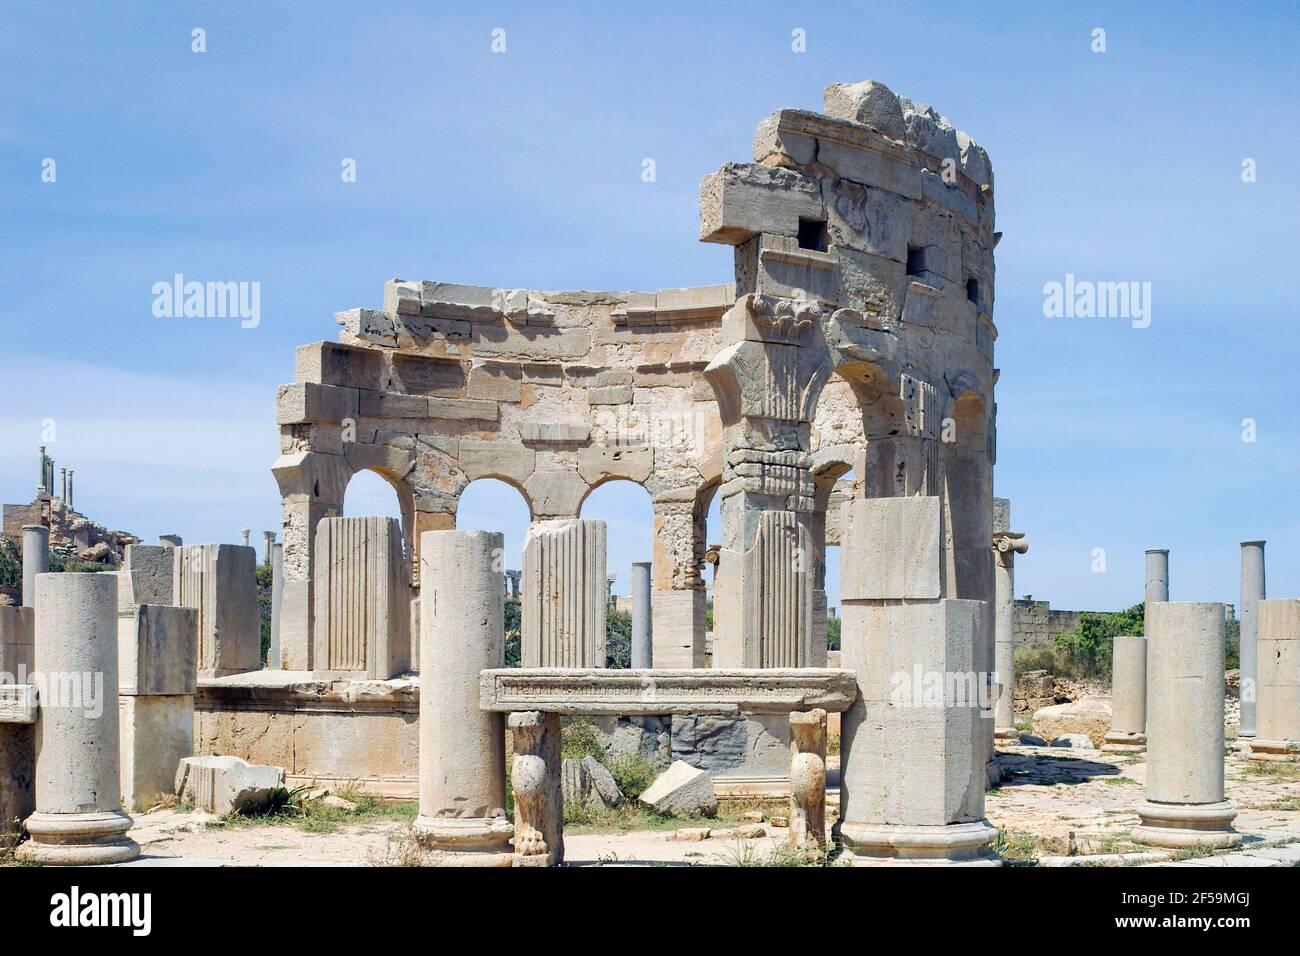 Market Place, Leptis Magna, Libia Foto Stock